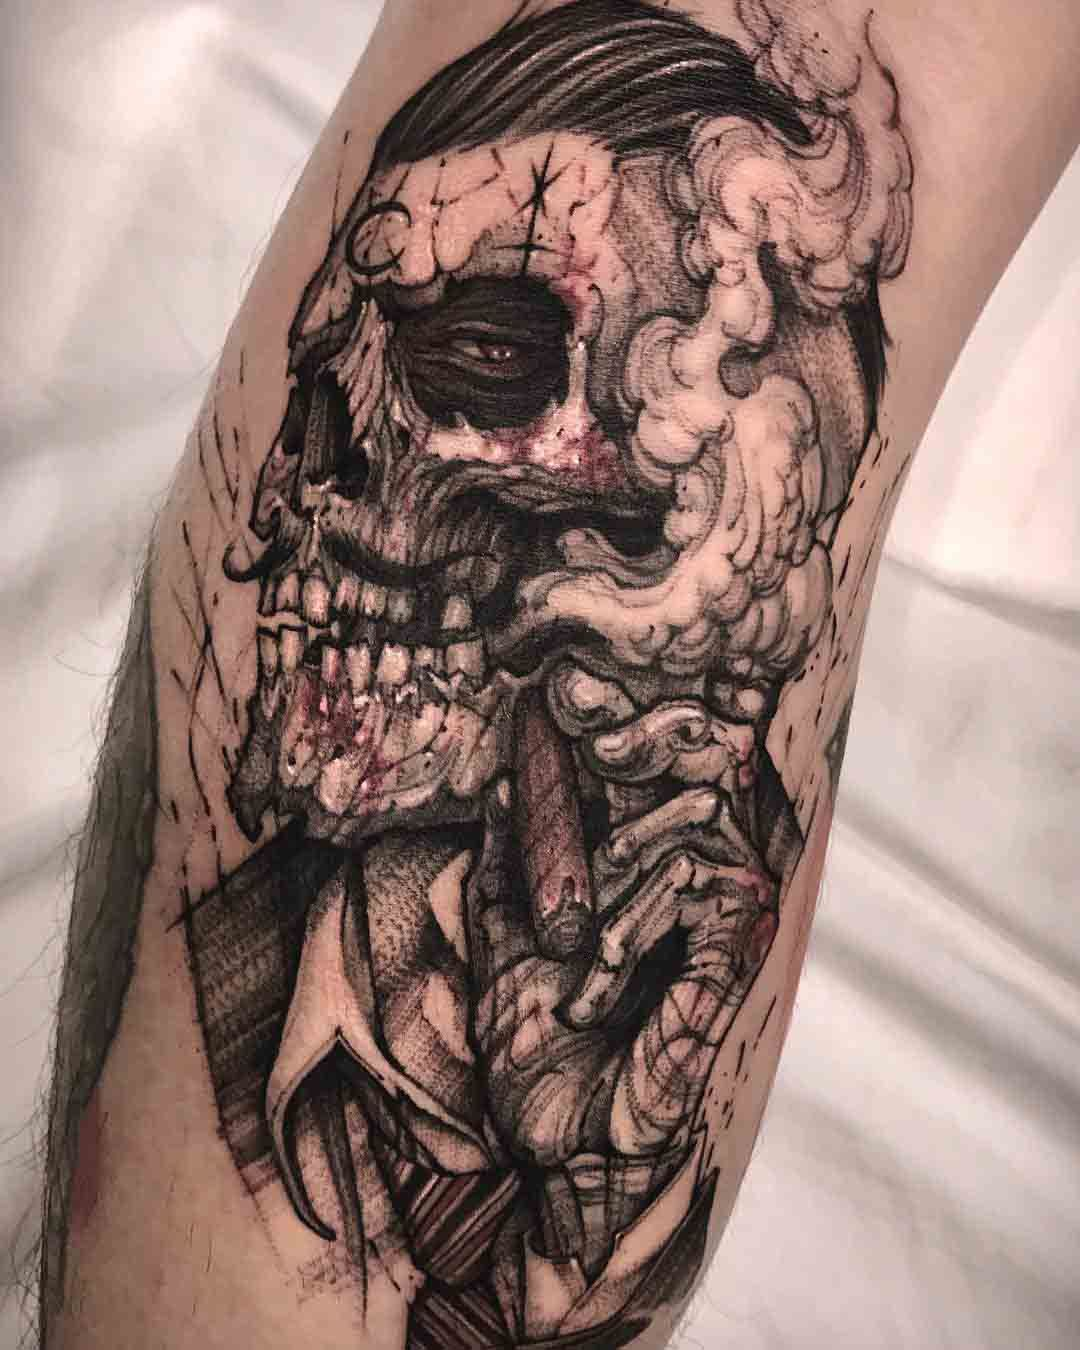 Old Gang Tattoo Graphic Tattoo Calaveras Tatuajes Tatuajes De